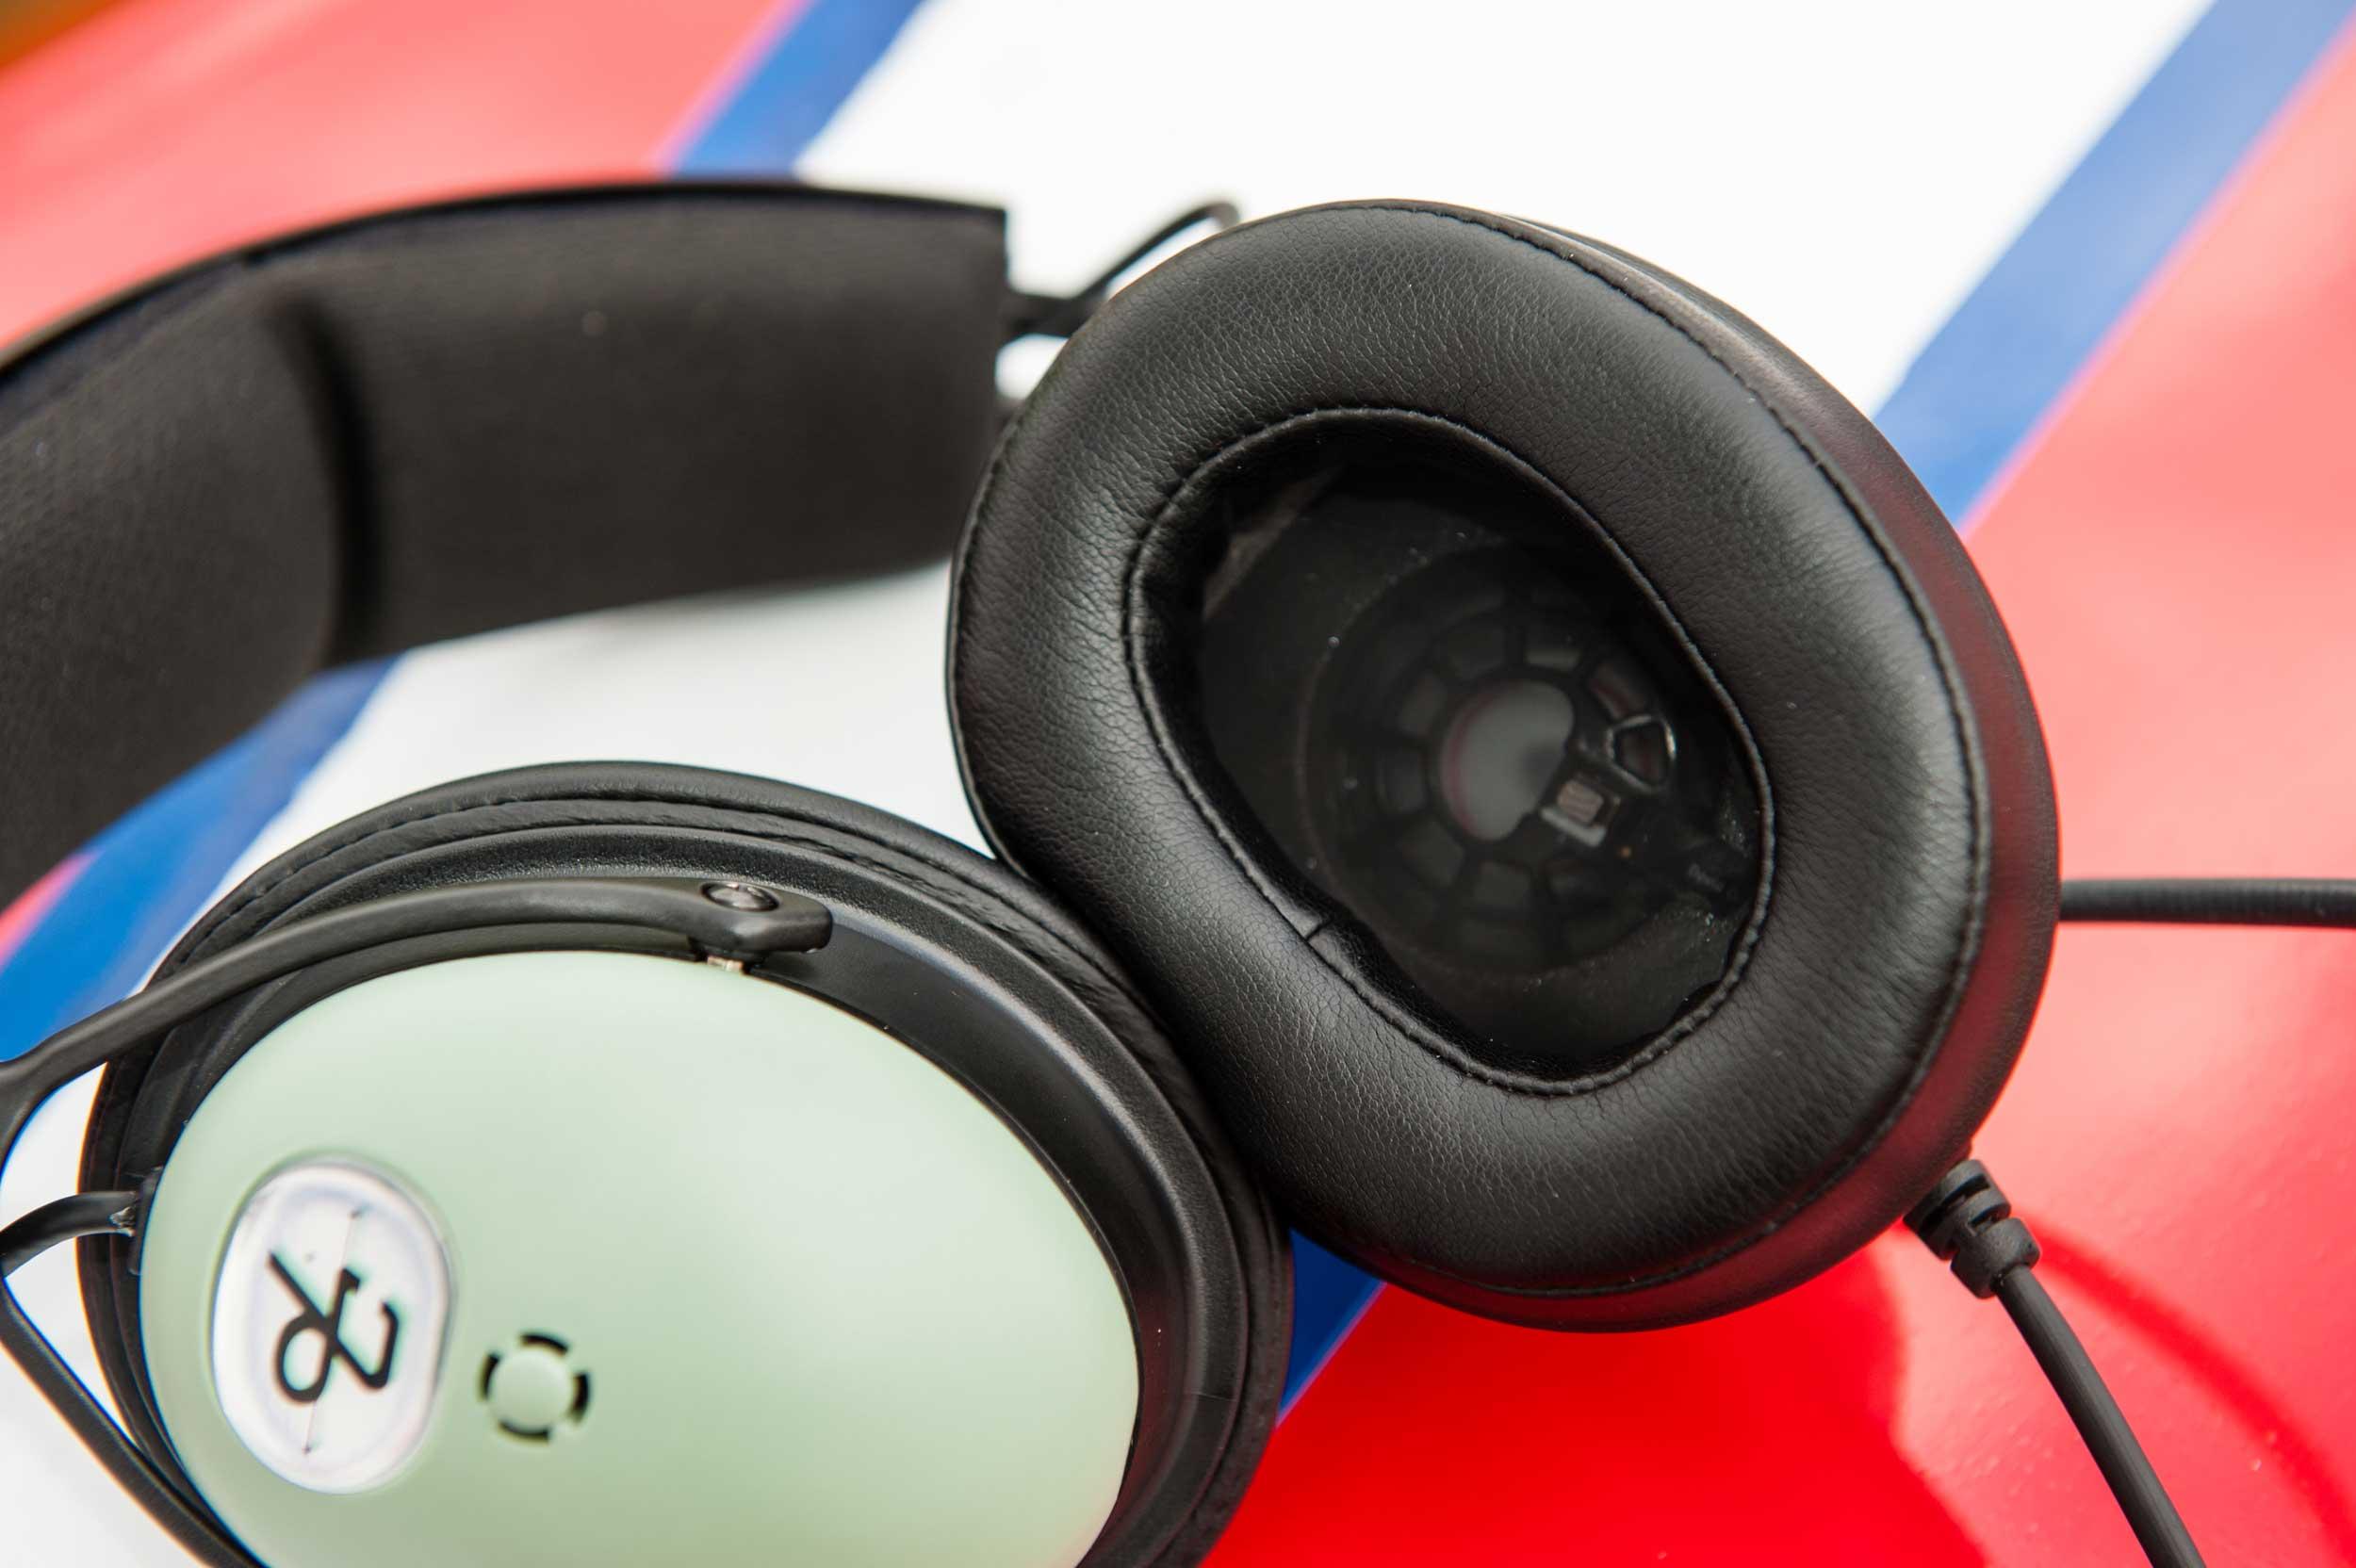 David-Clark-ONE-X-headset-3